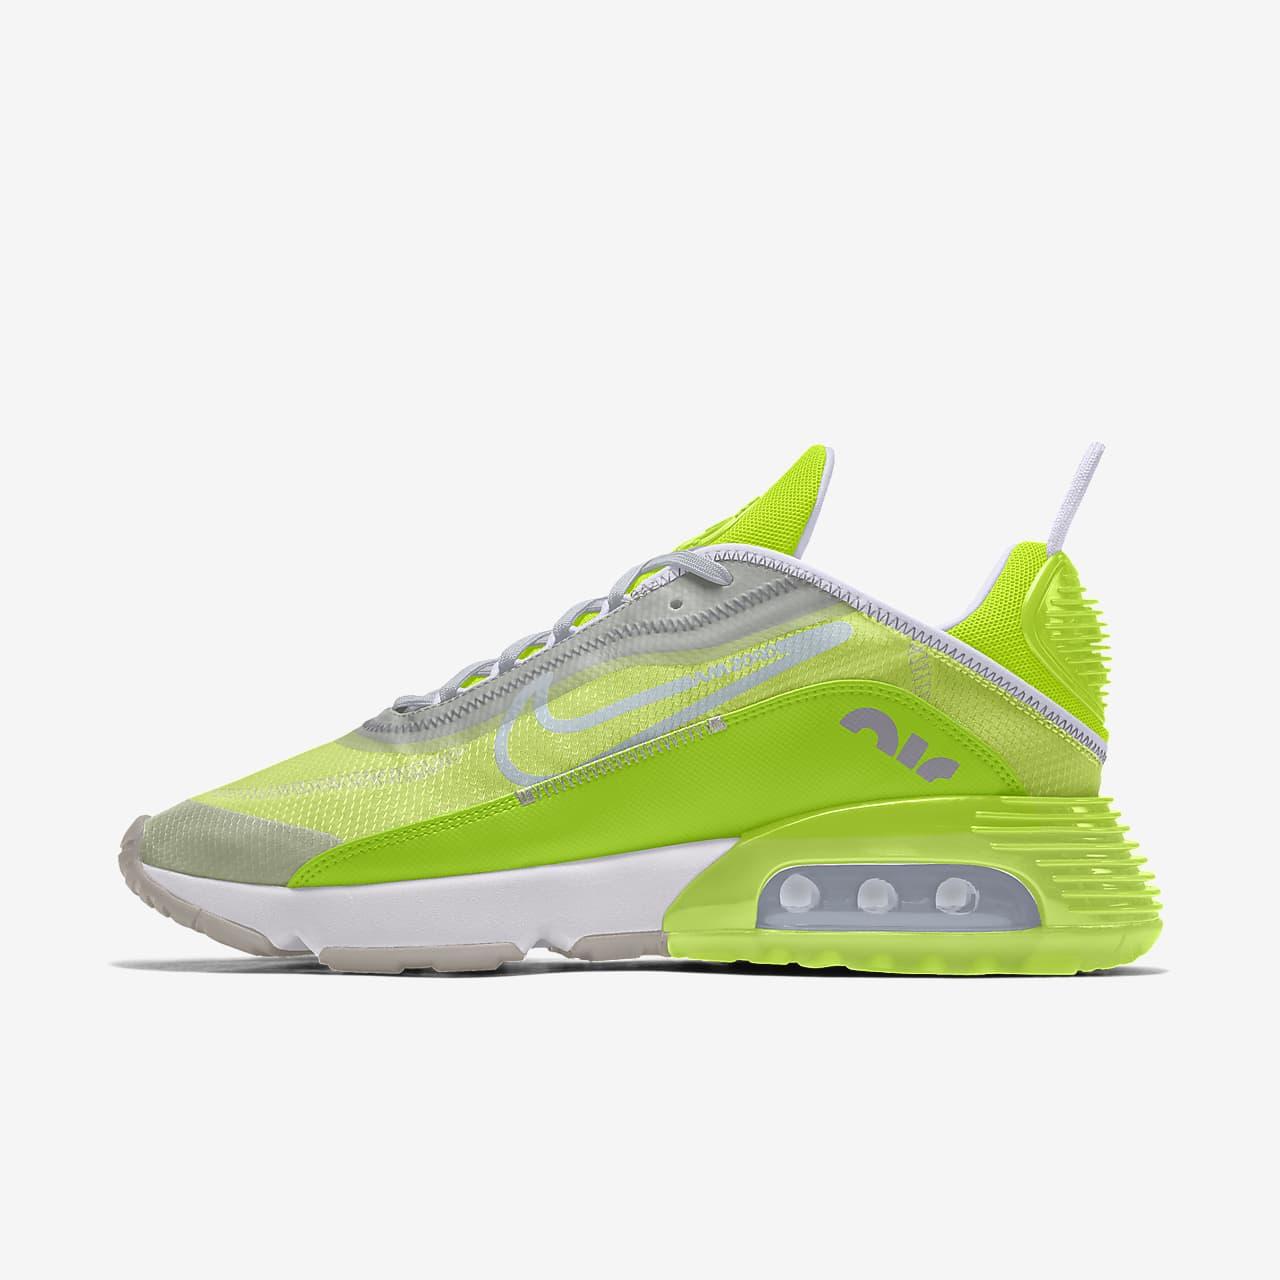 Nike Air Max 2090 By You Custom Schoen